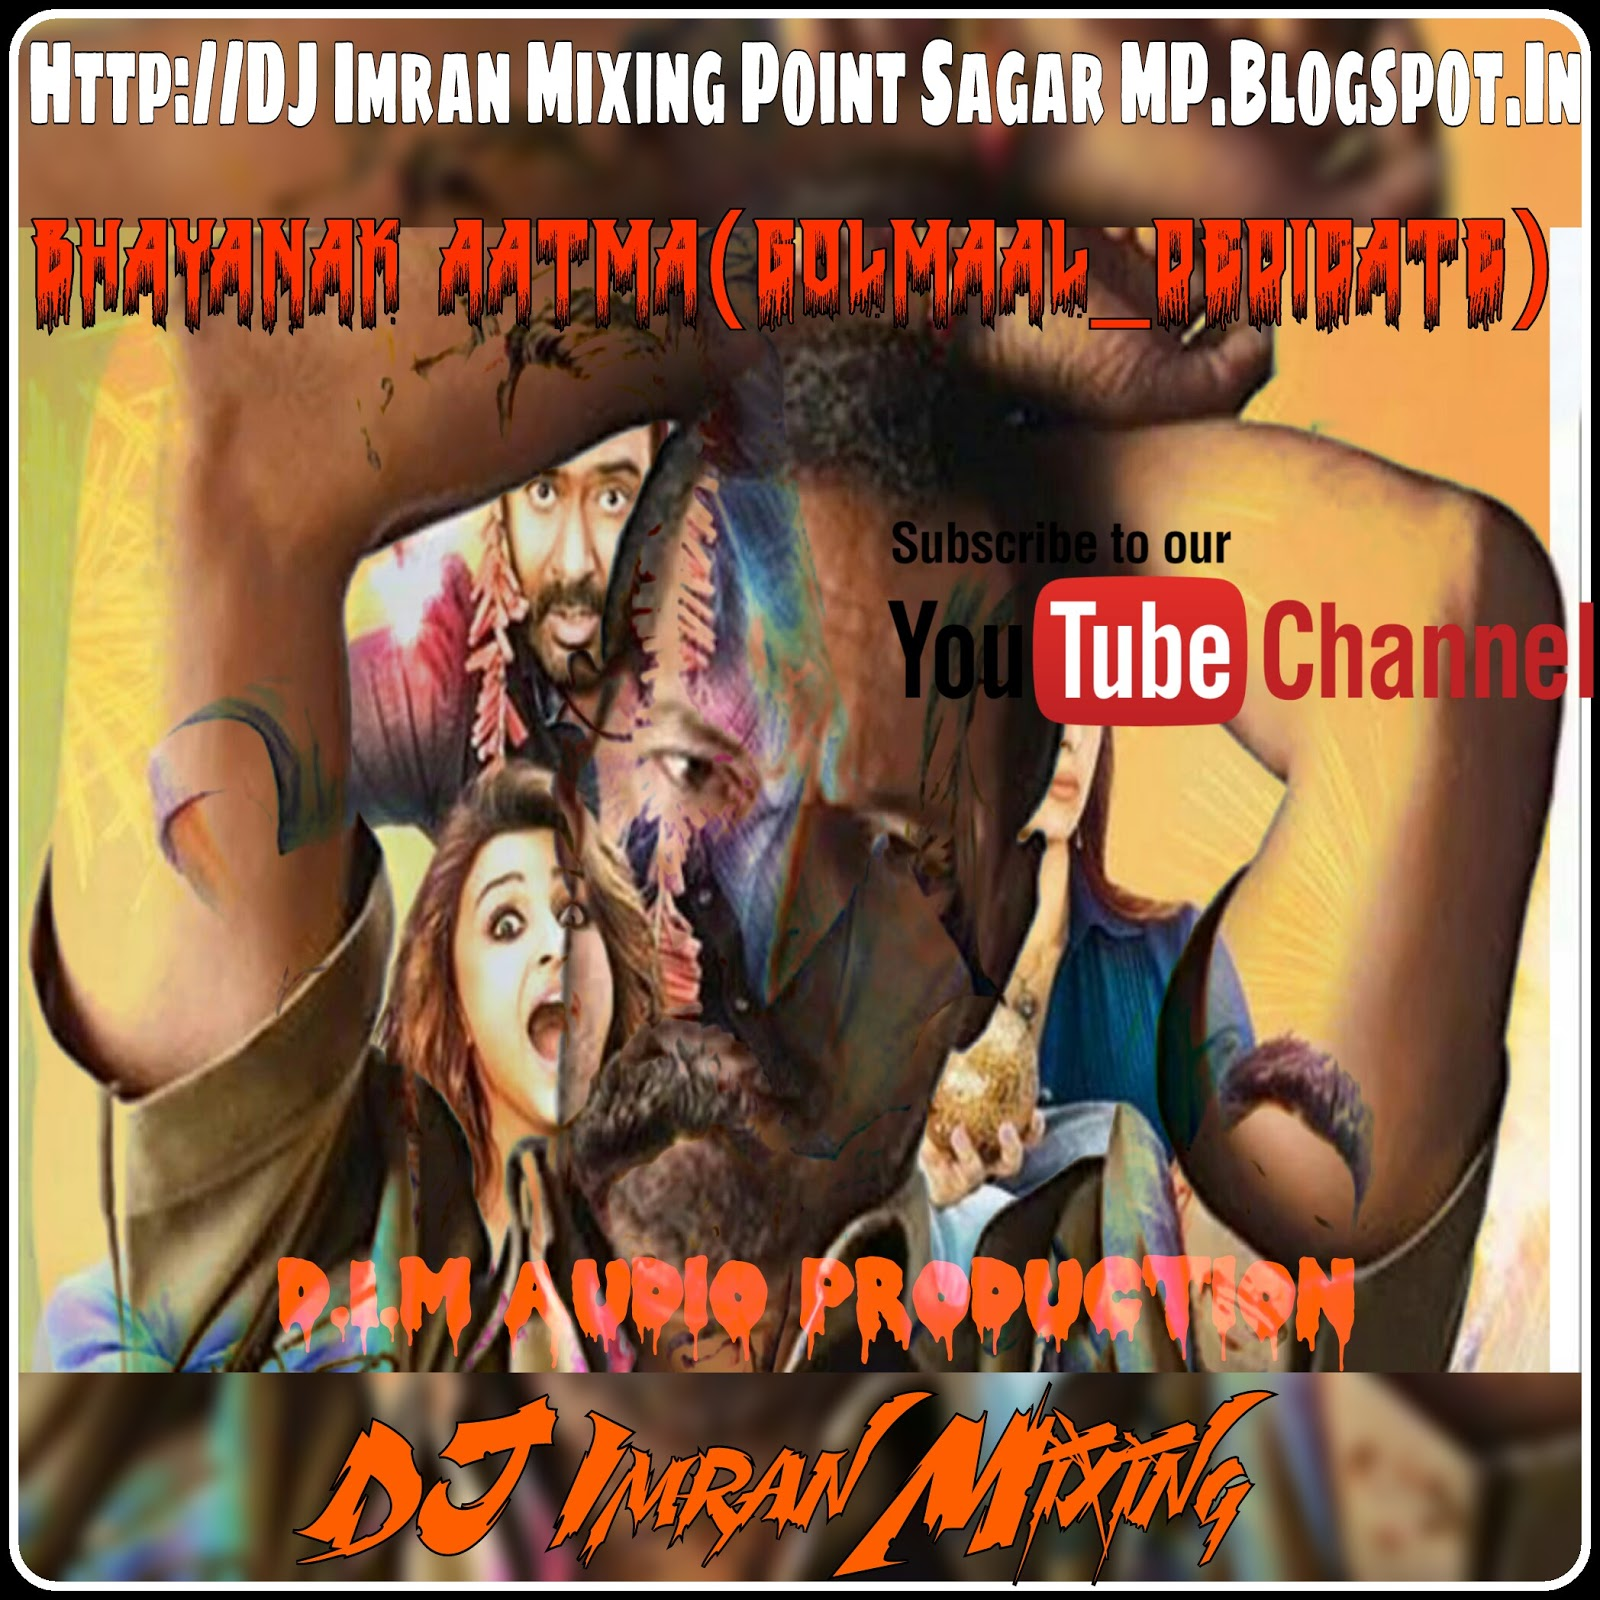 Imran Khan Song I Am Rider Mp3 Download: DJ Imran Mixing_D.I.M Audio Sagar M.P.: Download:-BHAYANAK